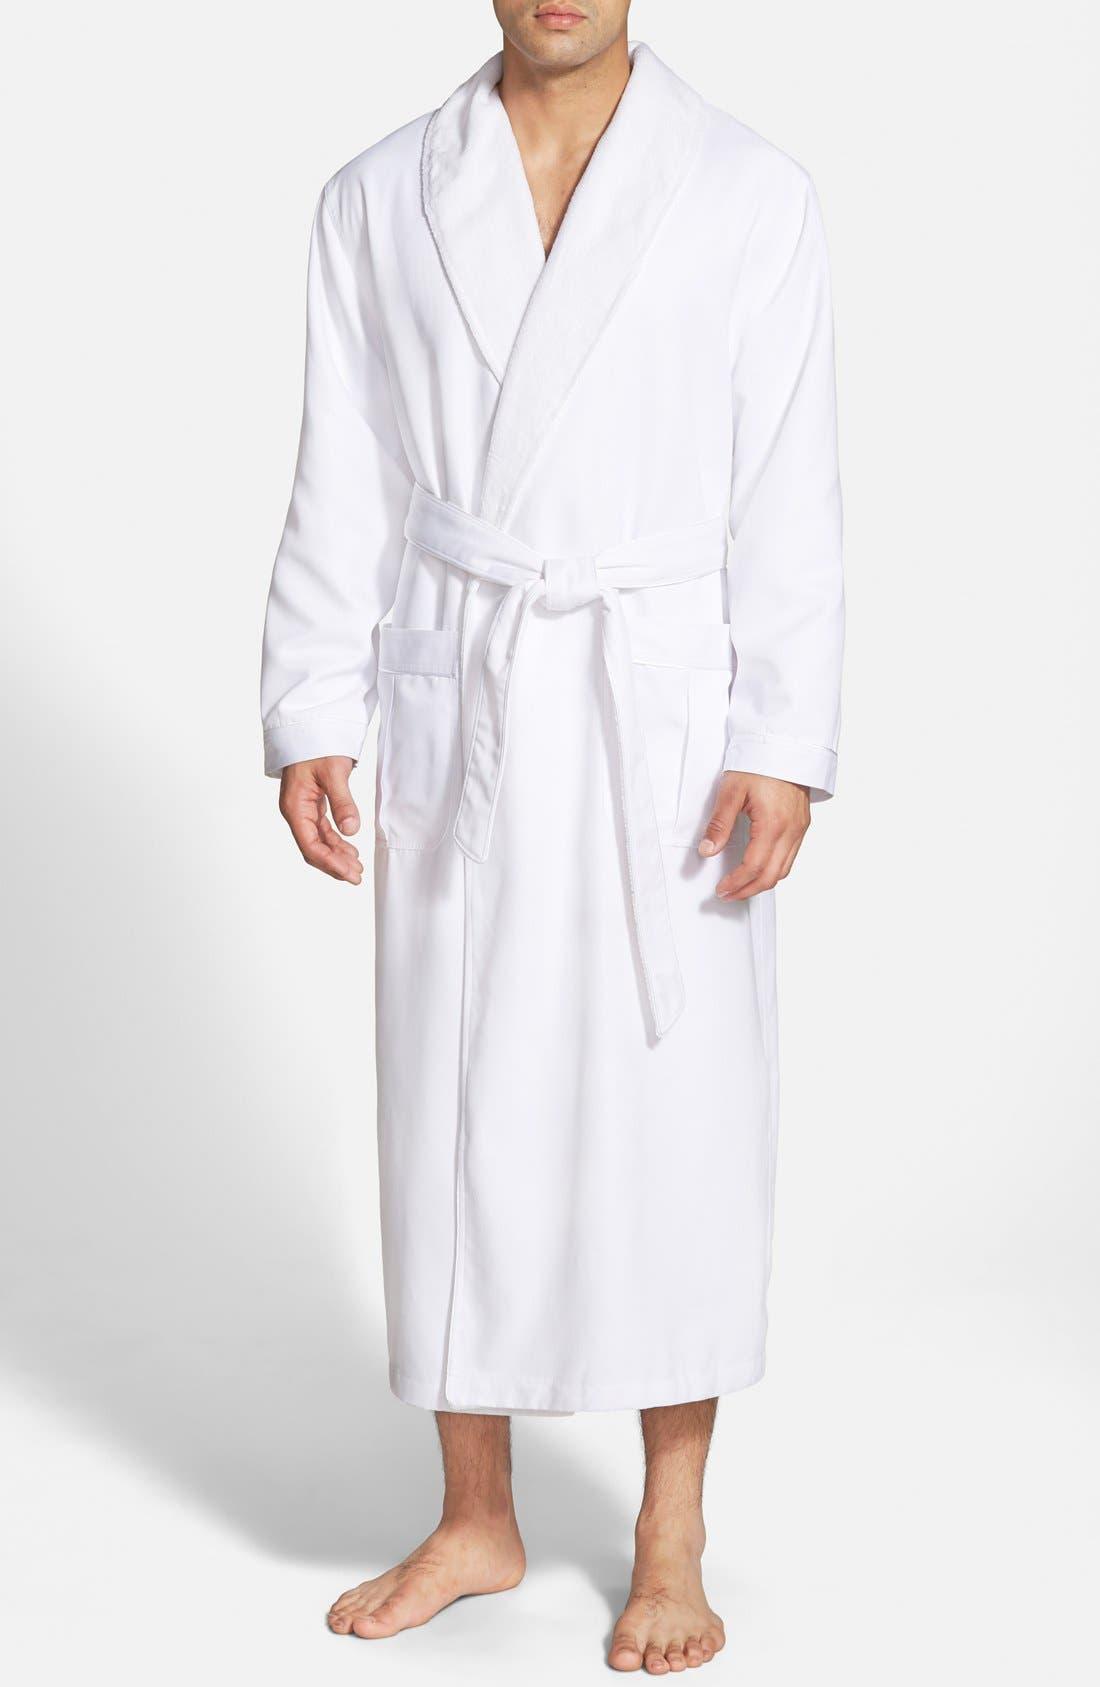 MAJESTIC INTERNATIONAL, Fleece Lined Robe, Main thumbnail 1, color, WHITE